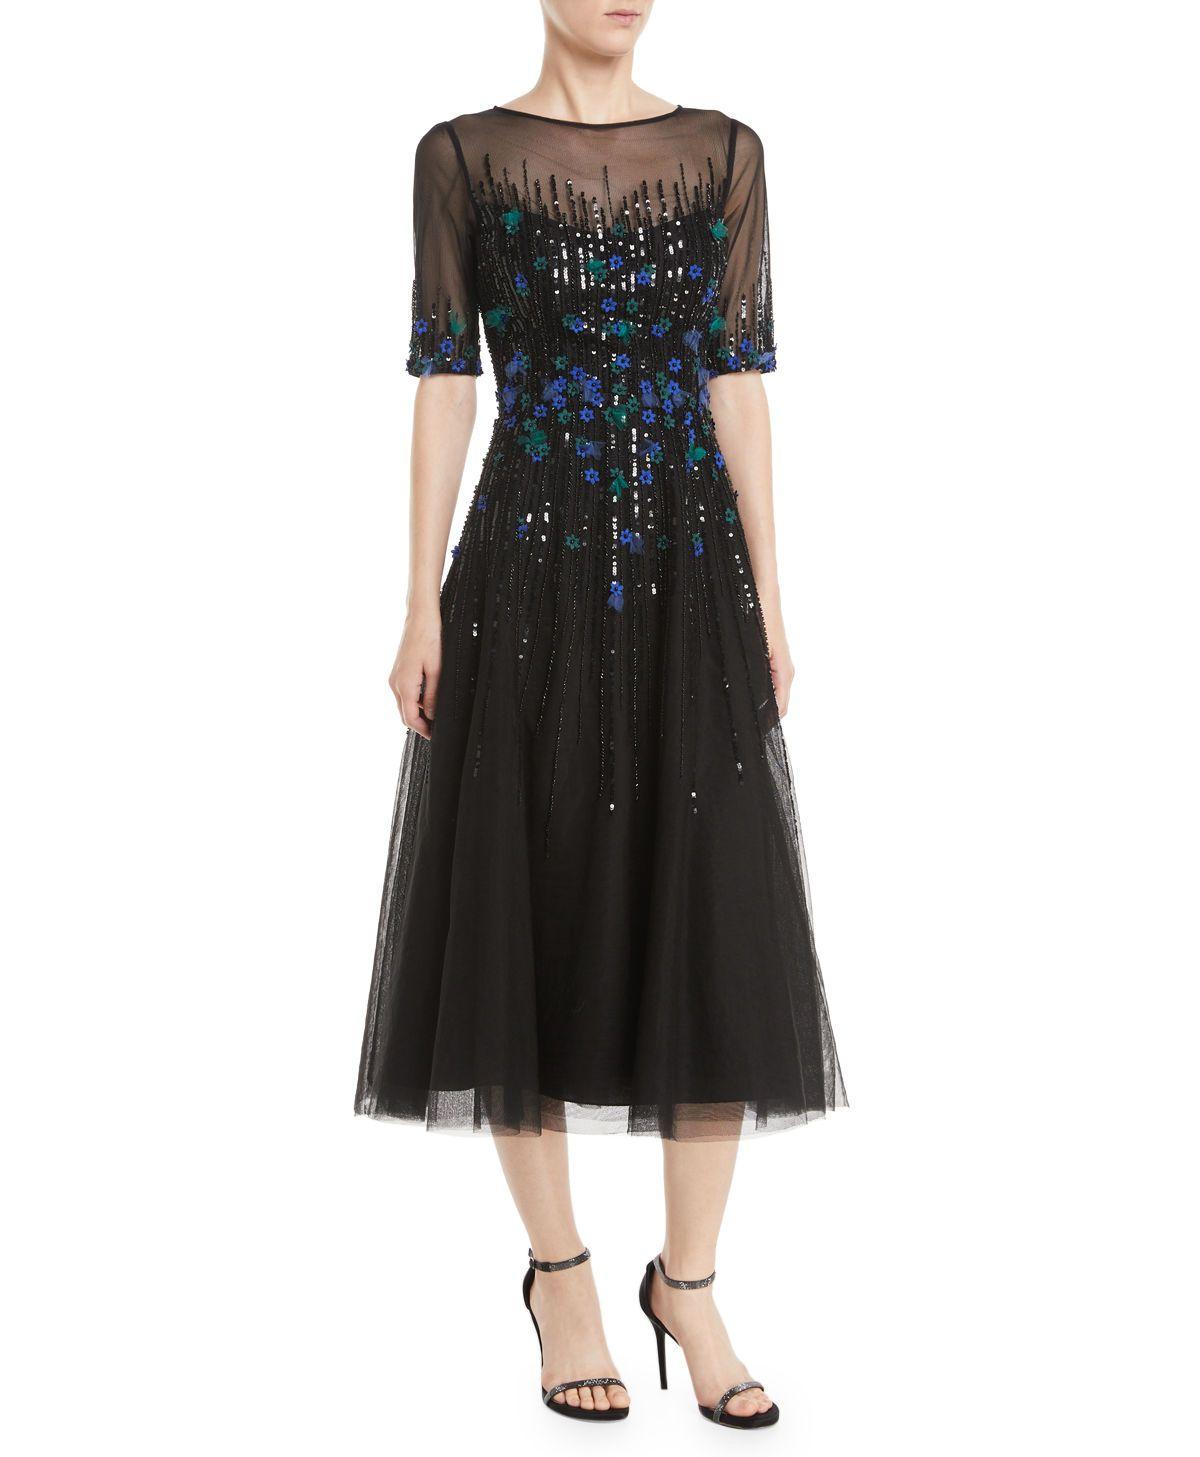 256ce24b49b Teri Jon at Neiman Marcus. 3 4-Sleeve Florals Beaded Tulle Cocktail Dress